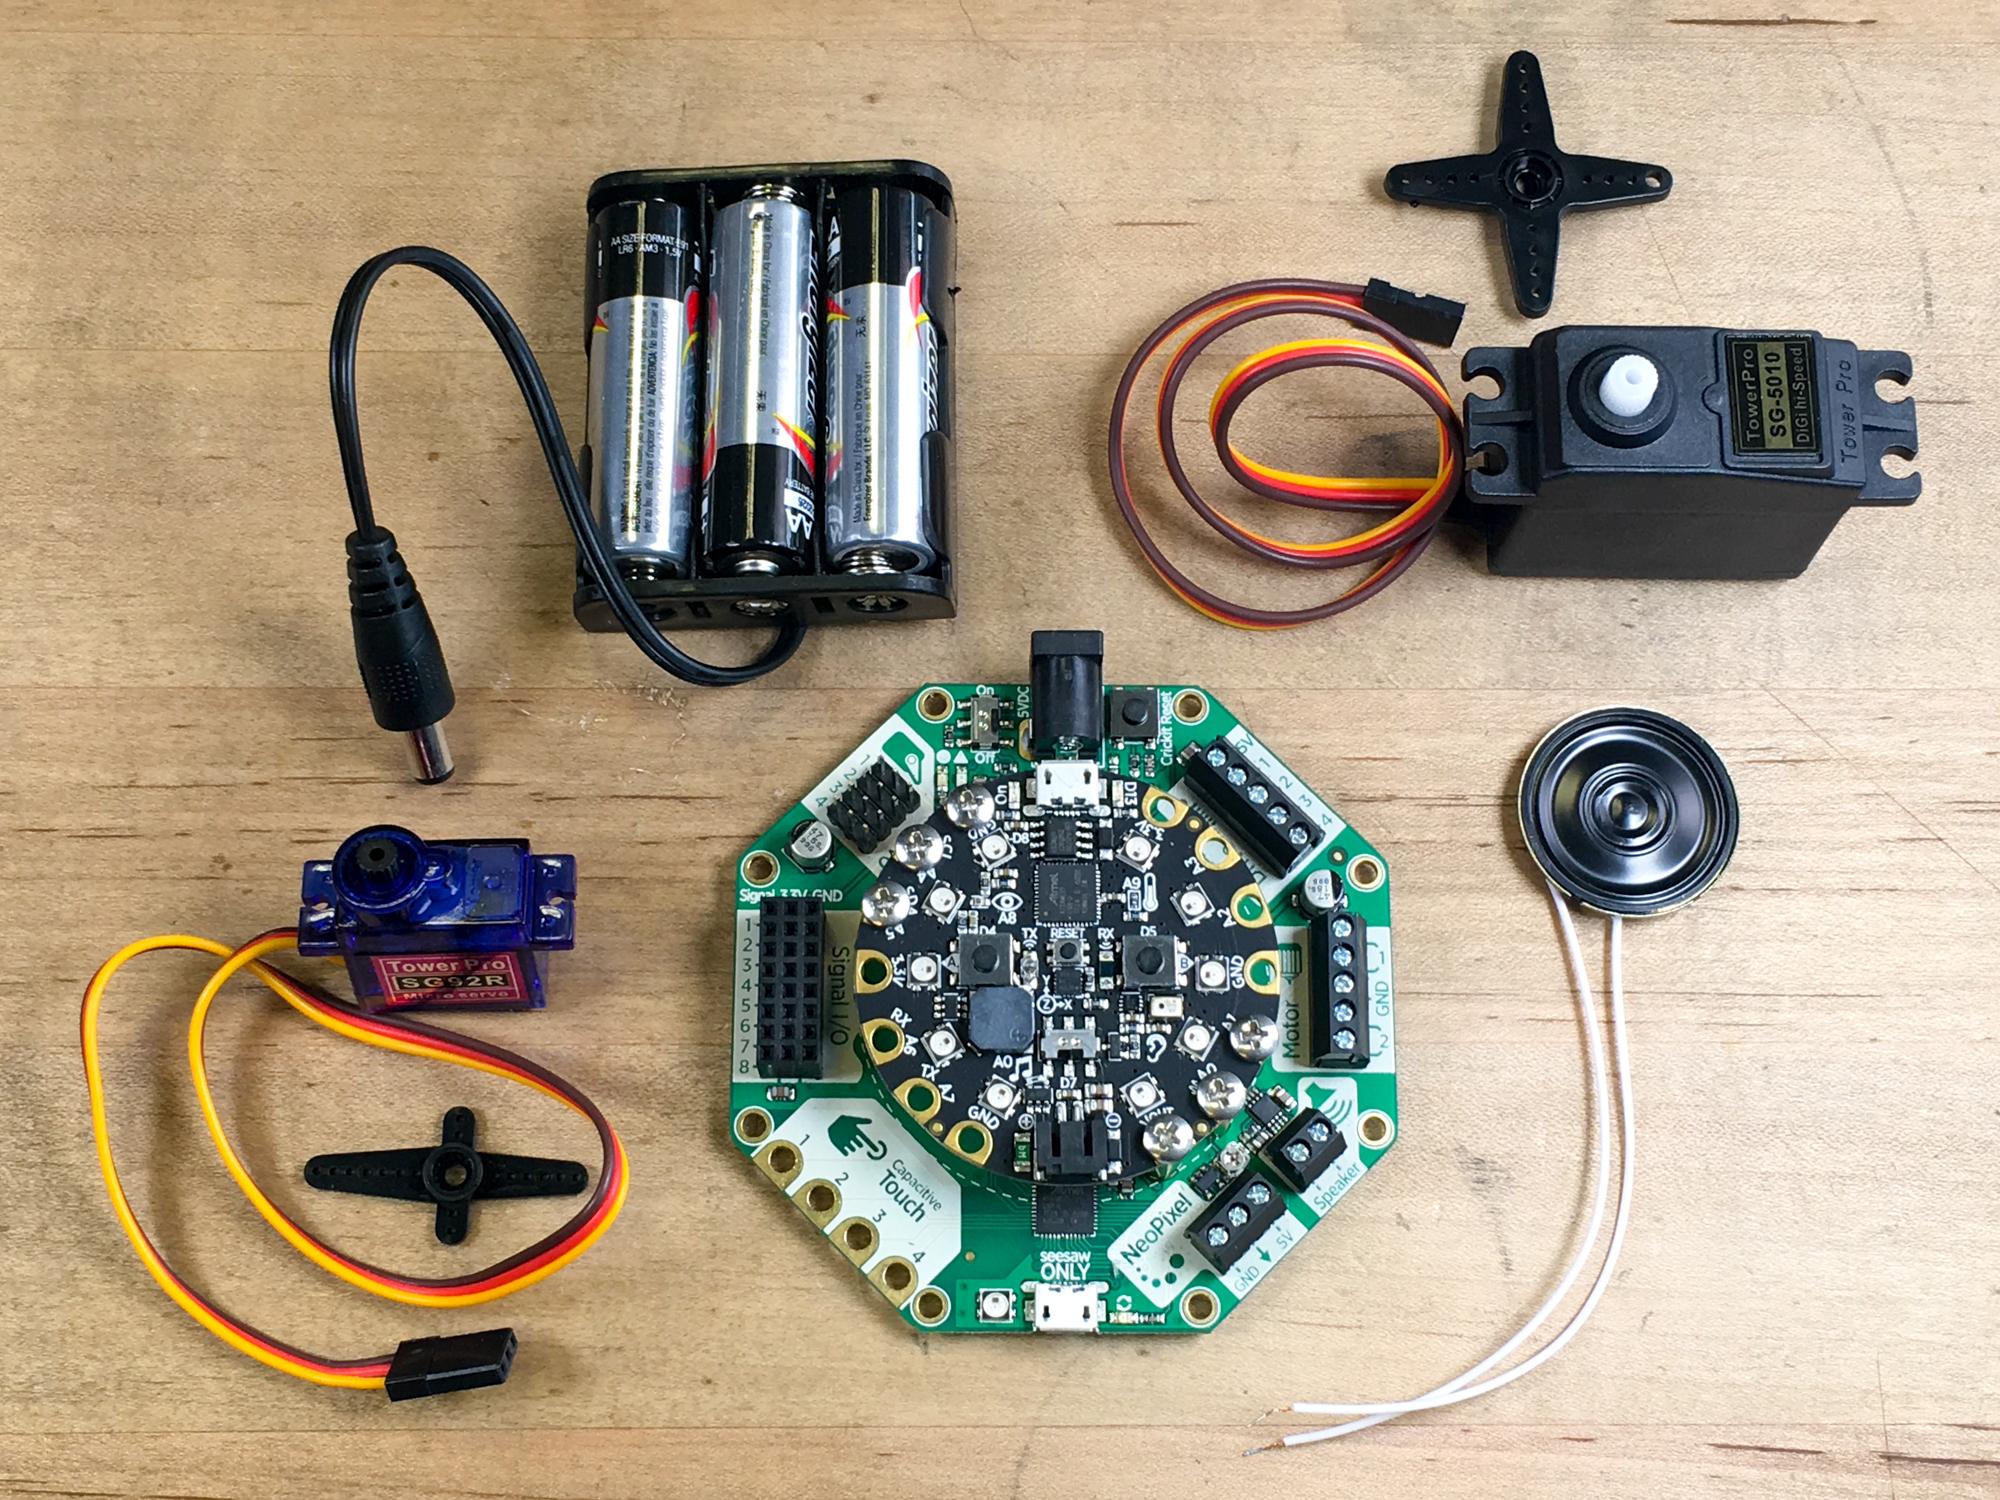 circuitpython_minerva_0001_2k.jpg